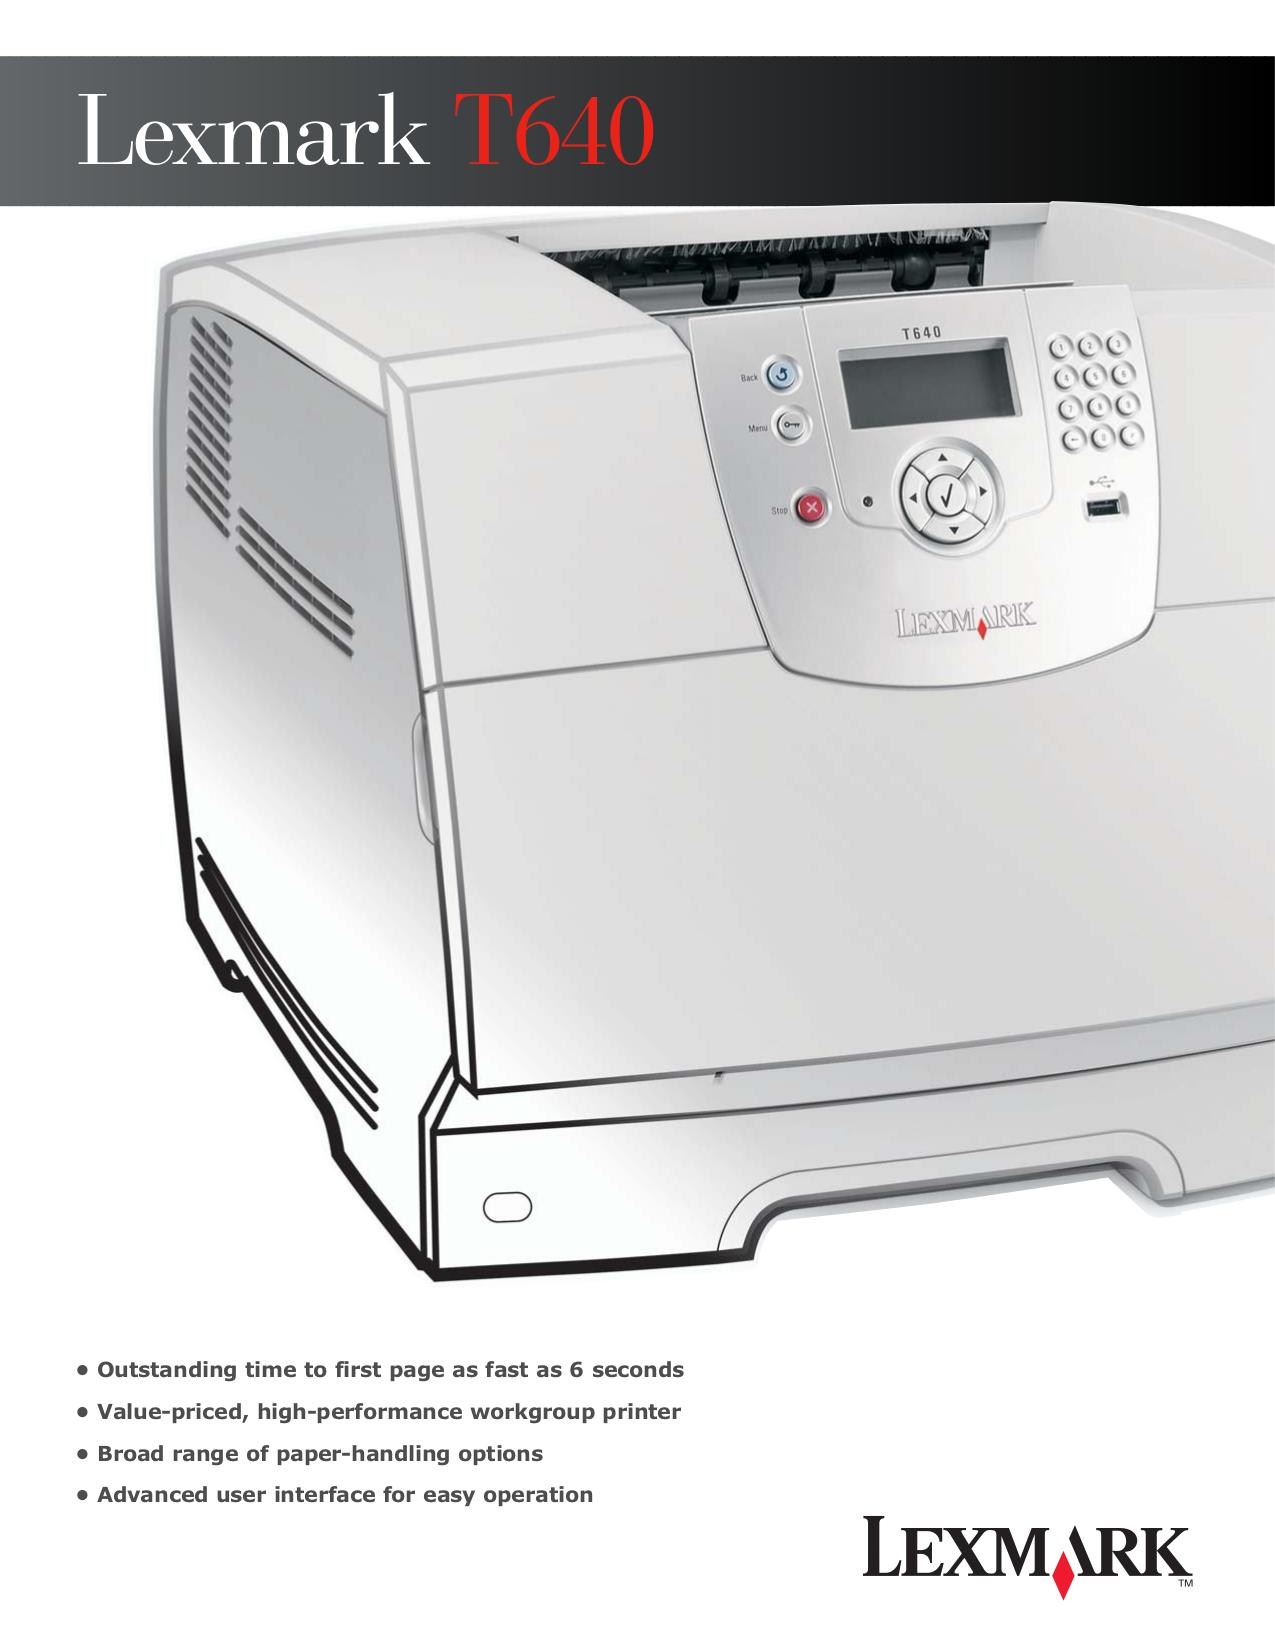 lexmark t644 printer manual open source user manual u2022 rh dramatic varieties com Lexmark T642 Service Manual PDF Lexmark T642 Service Manual PDF